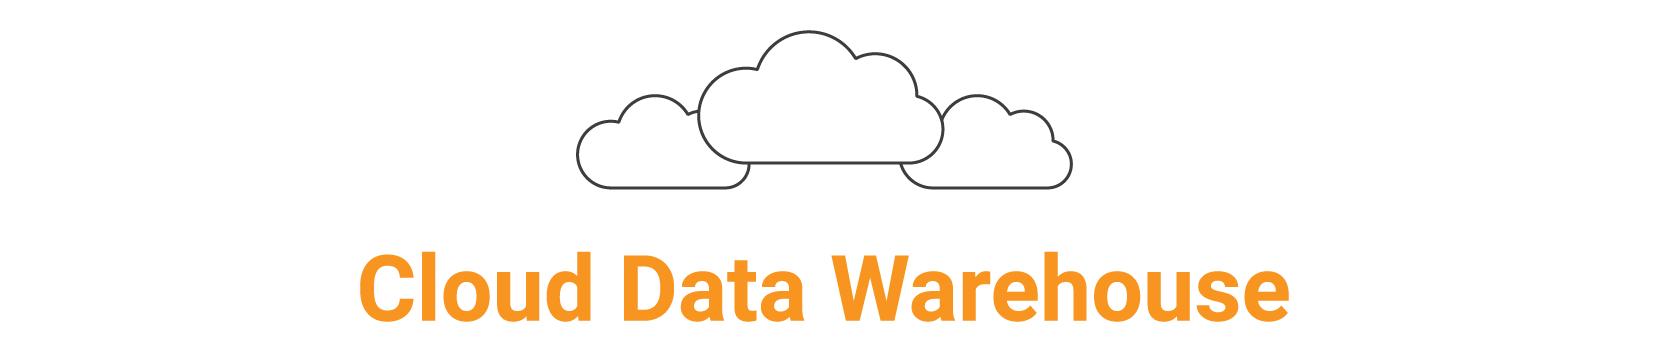 Cloud Data Warehouse  + ICON copy 2 (1)-1